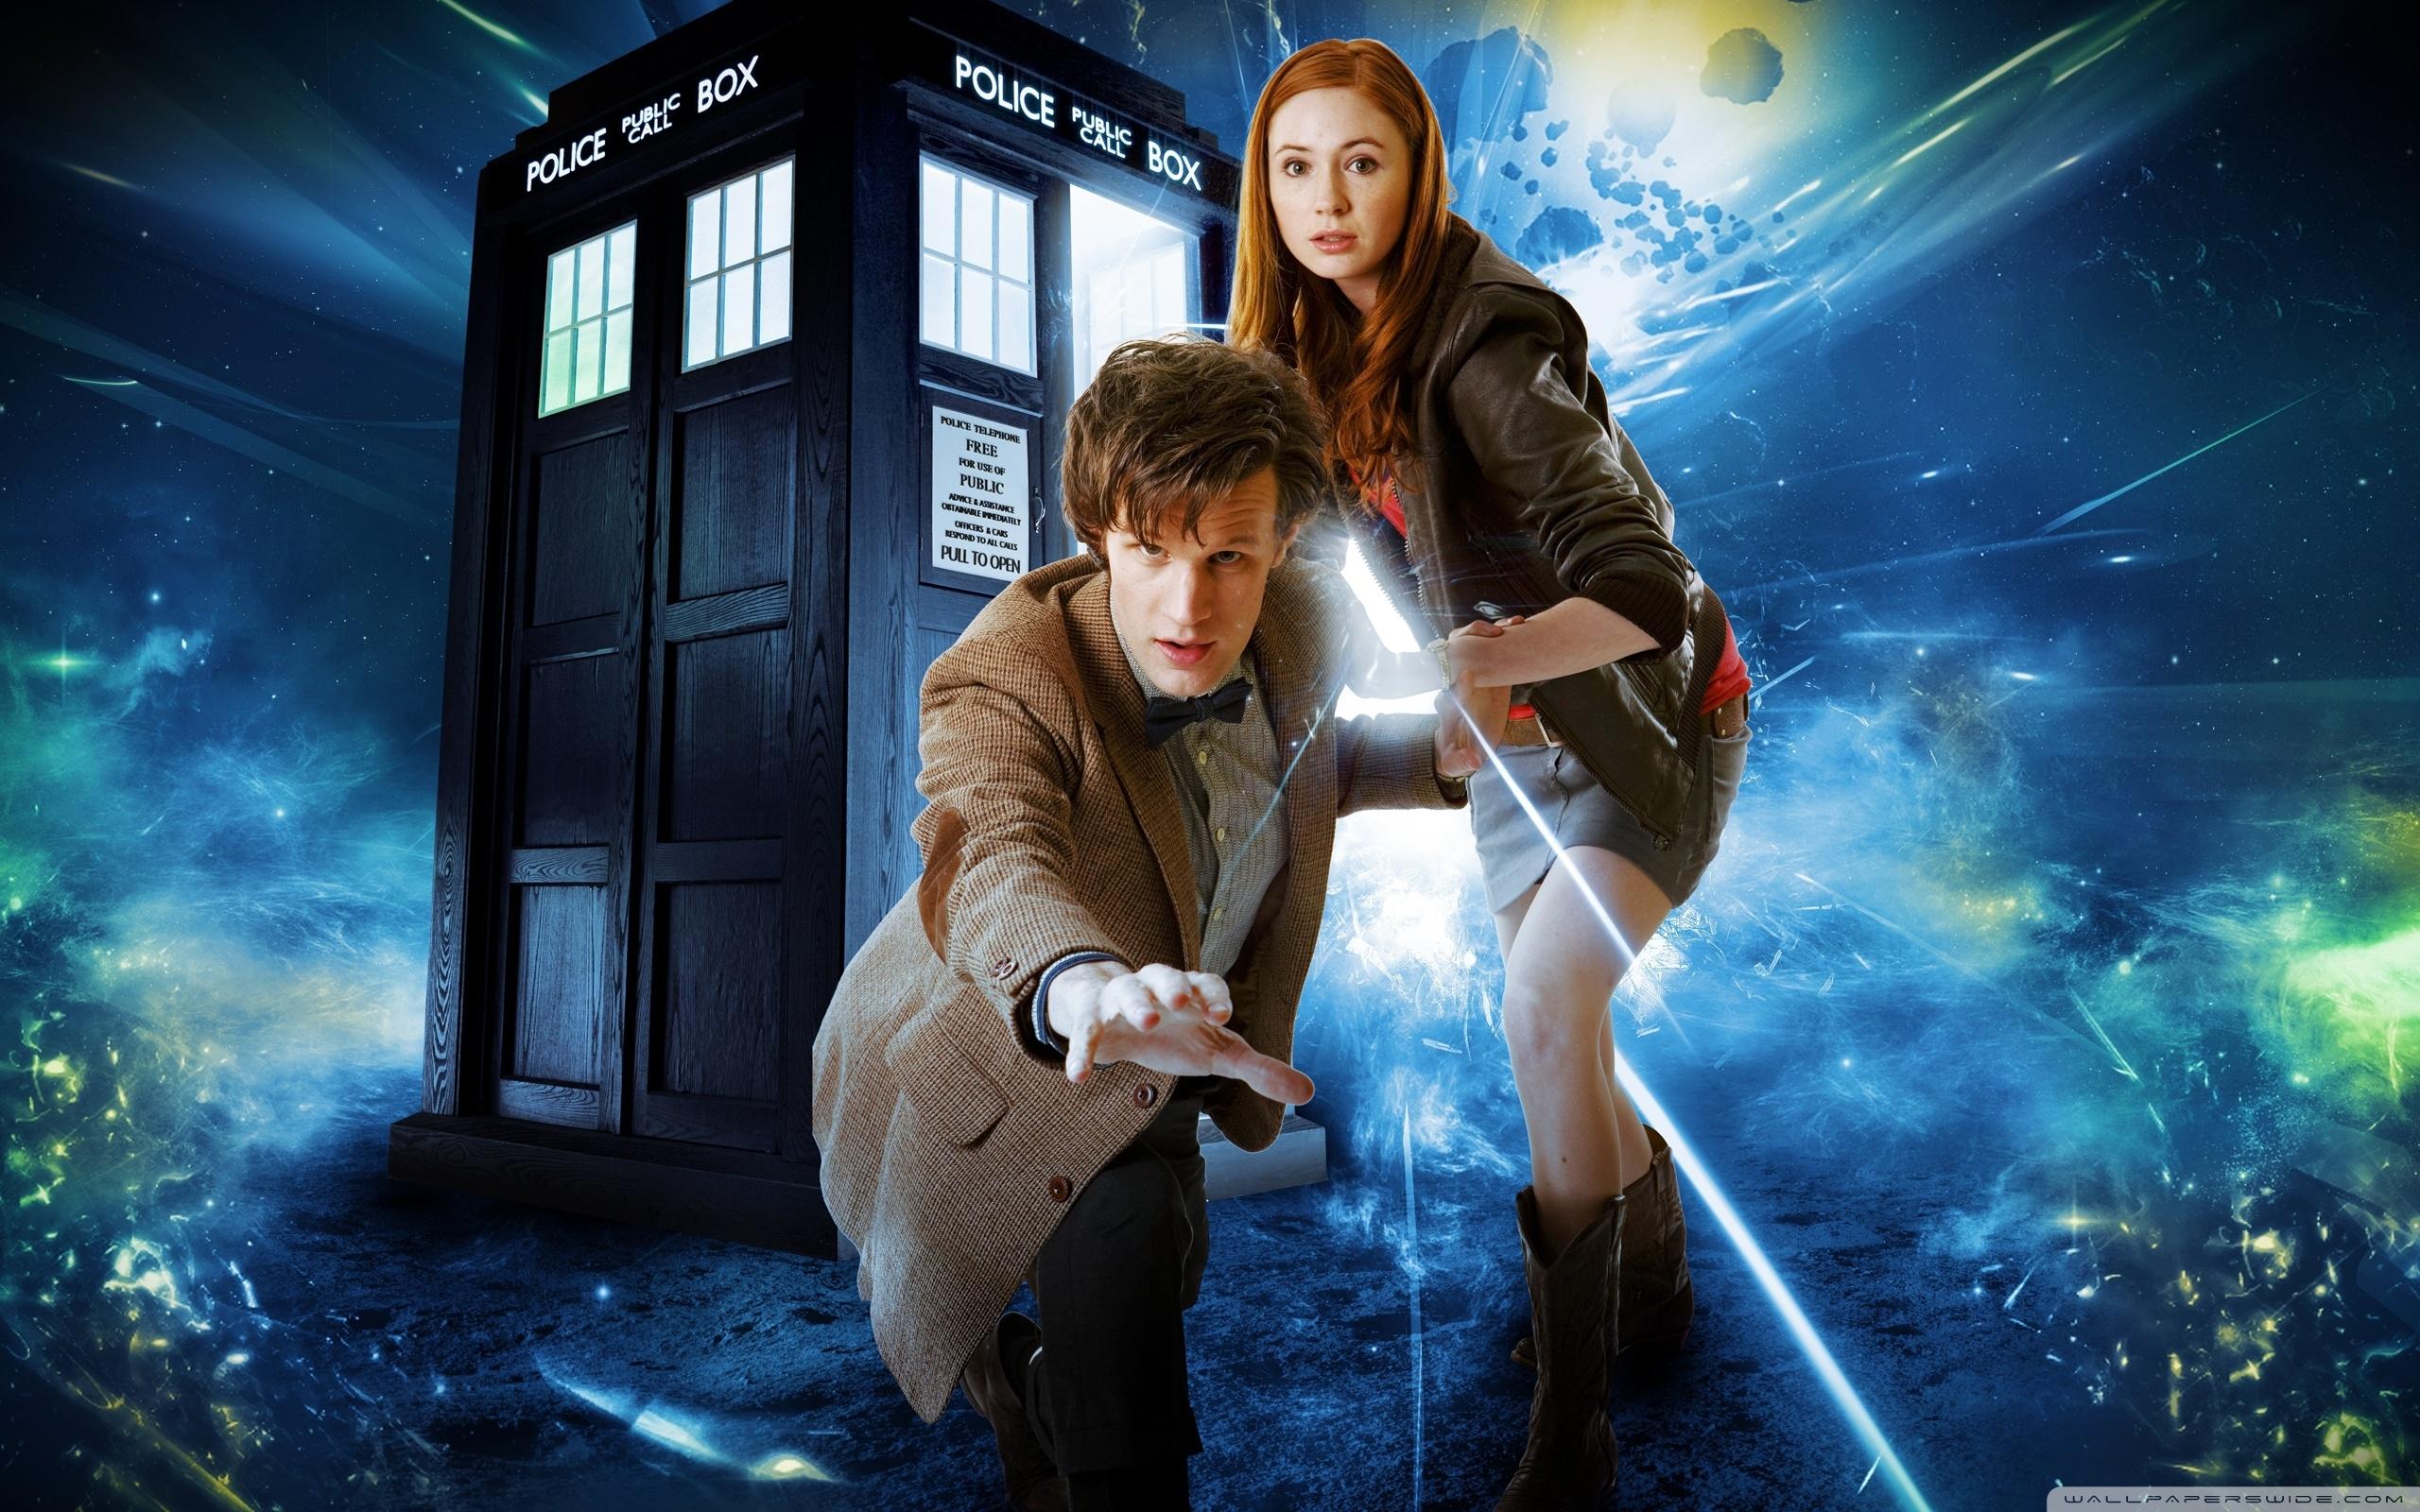 doctor who matt smith and karen gillan ❤ 4k hd desktop wallpaper